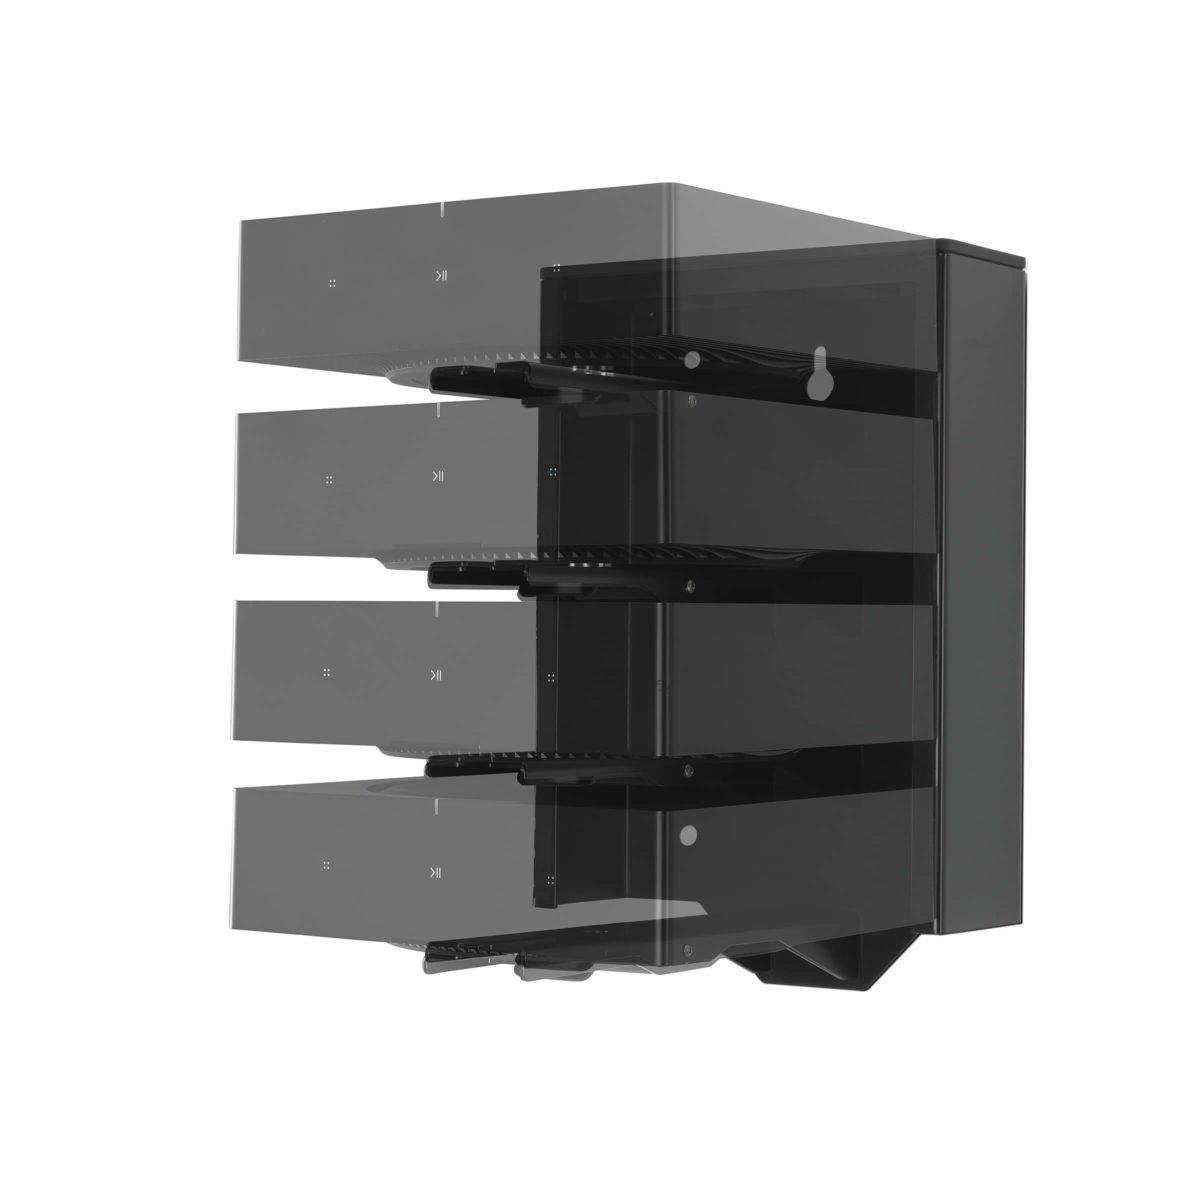 Flexson Sonos AMP dock 12